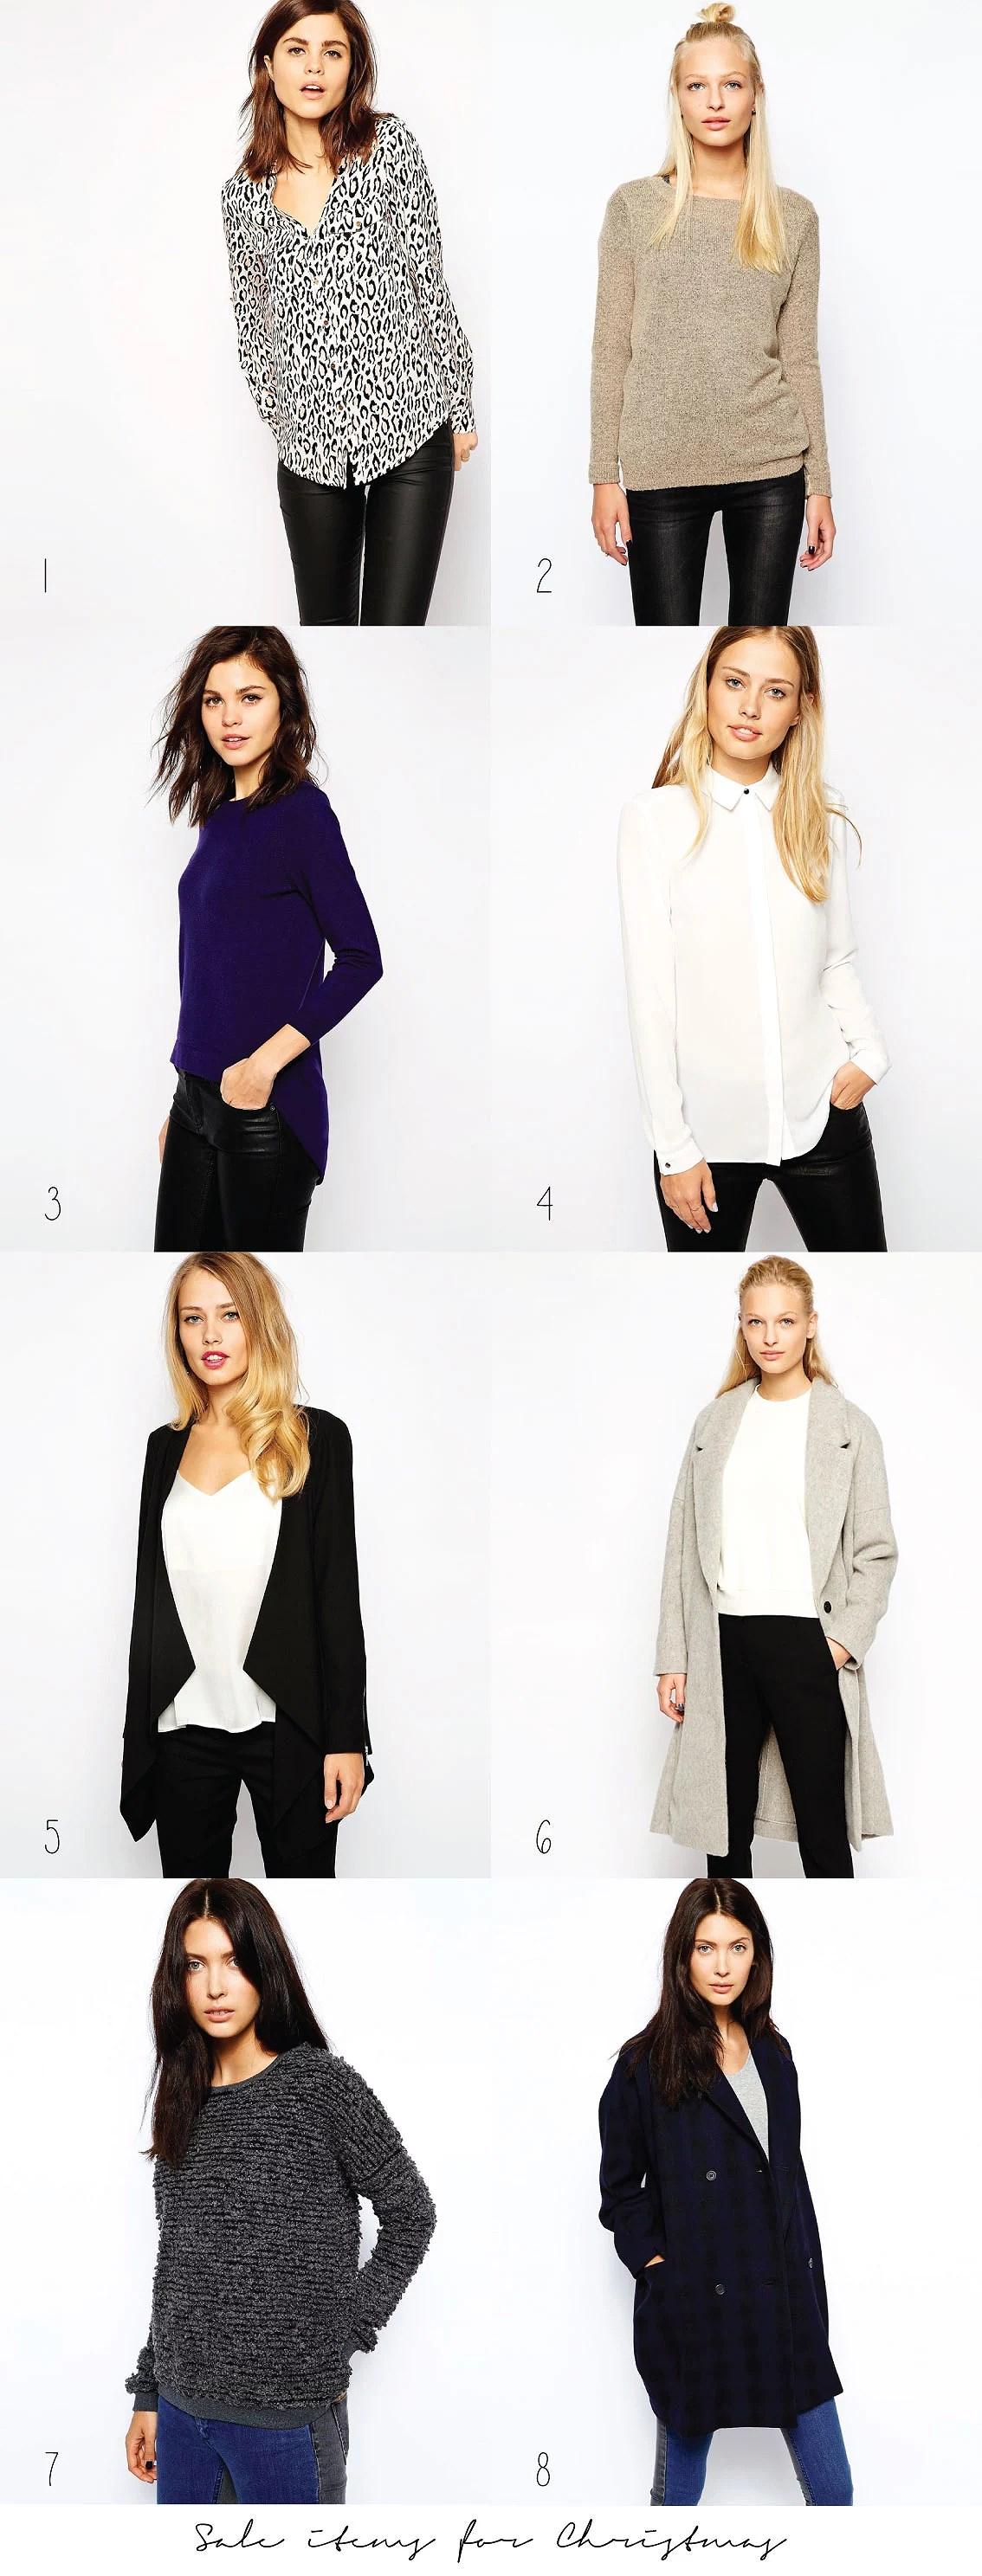 Aalborg blogger, Modeblogger, It's My Passions